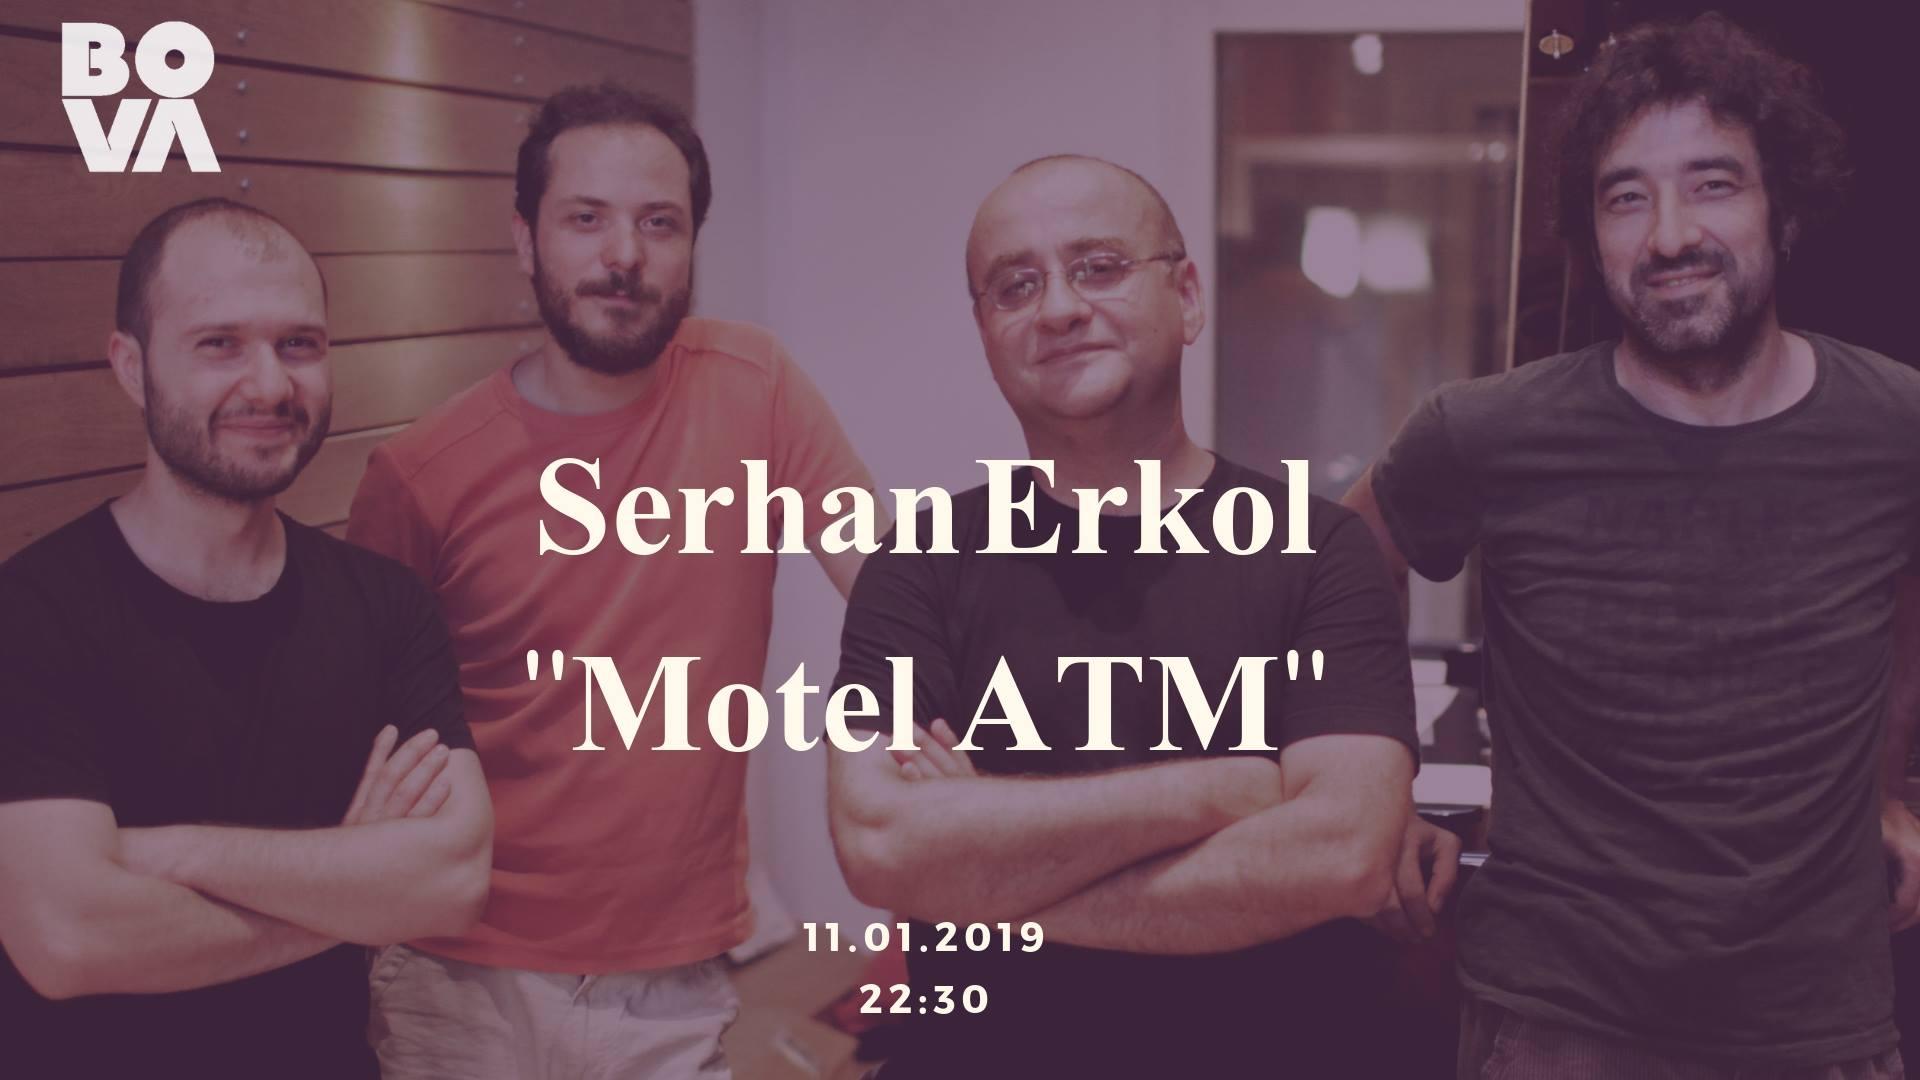 Serhan Erkol Motel Atm